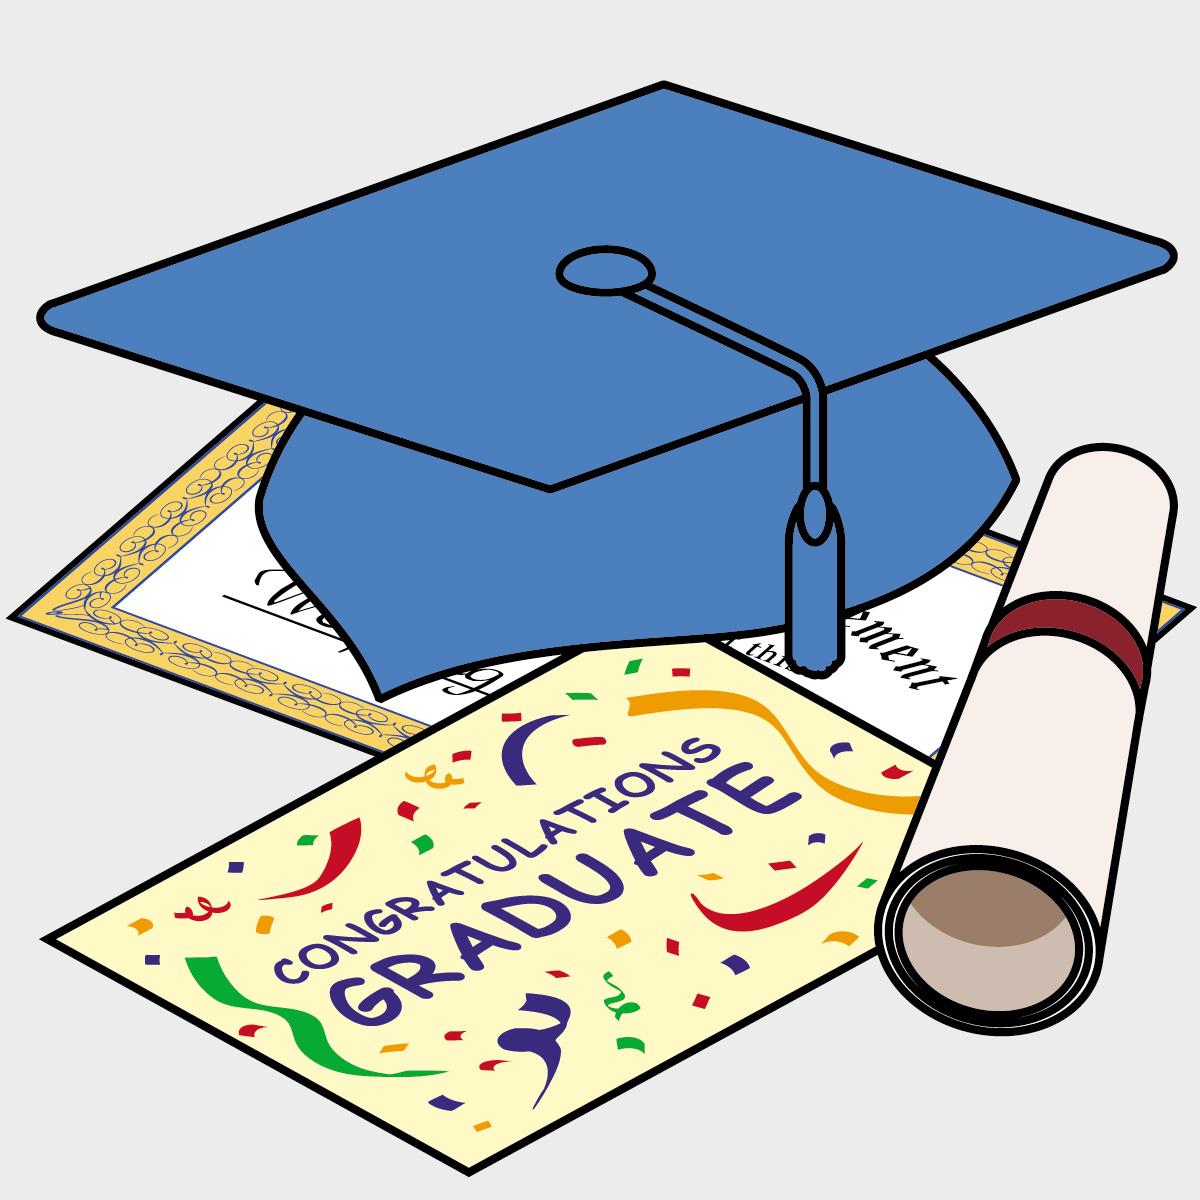 Kindergarten Graduation Clipart   Clipart Panda - Free Clipart Images - Free Printable Kindergarten Graduation Clipart